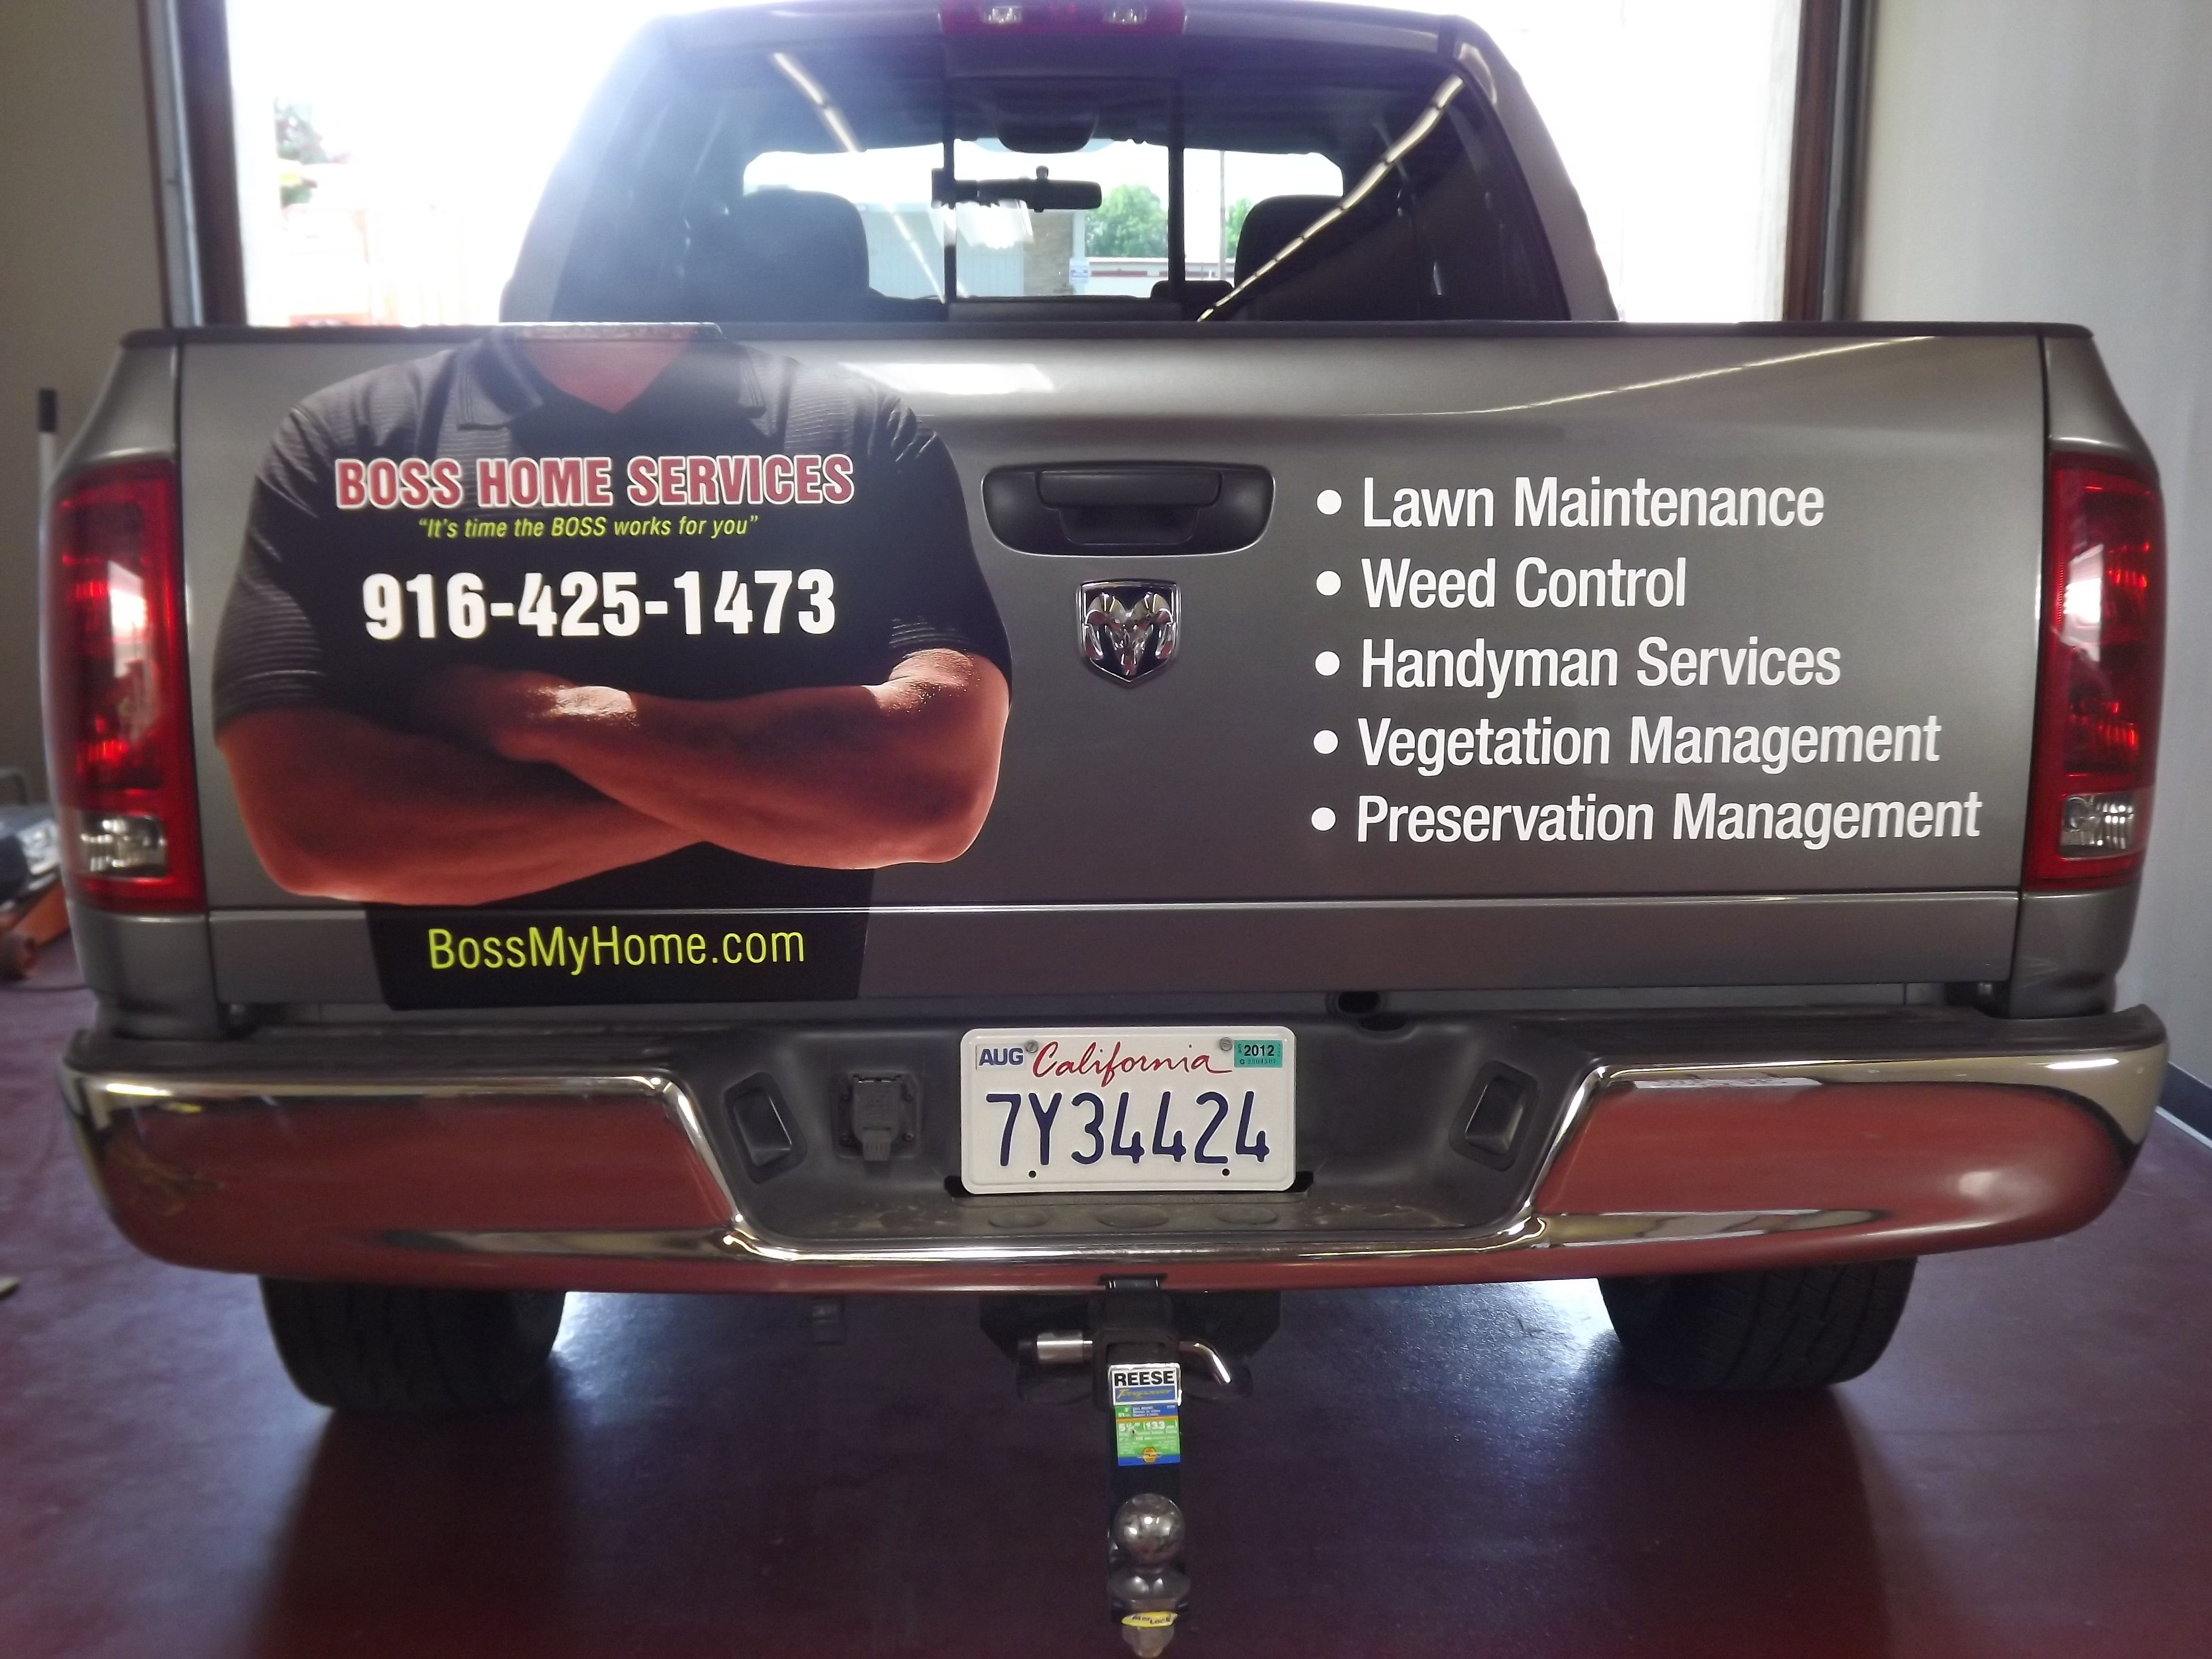 HANDYMAN FOR HIRE car vinyl decal vehicle bike graphic bumper sticker